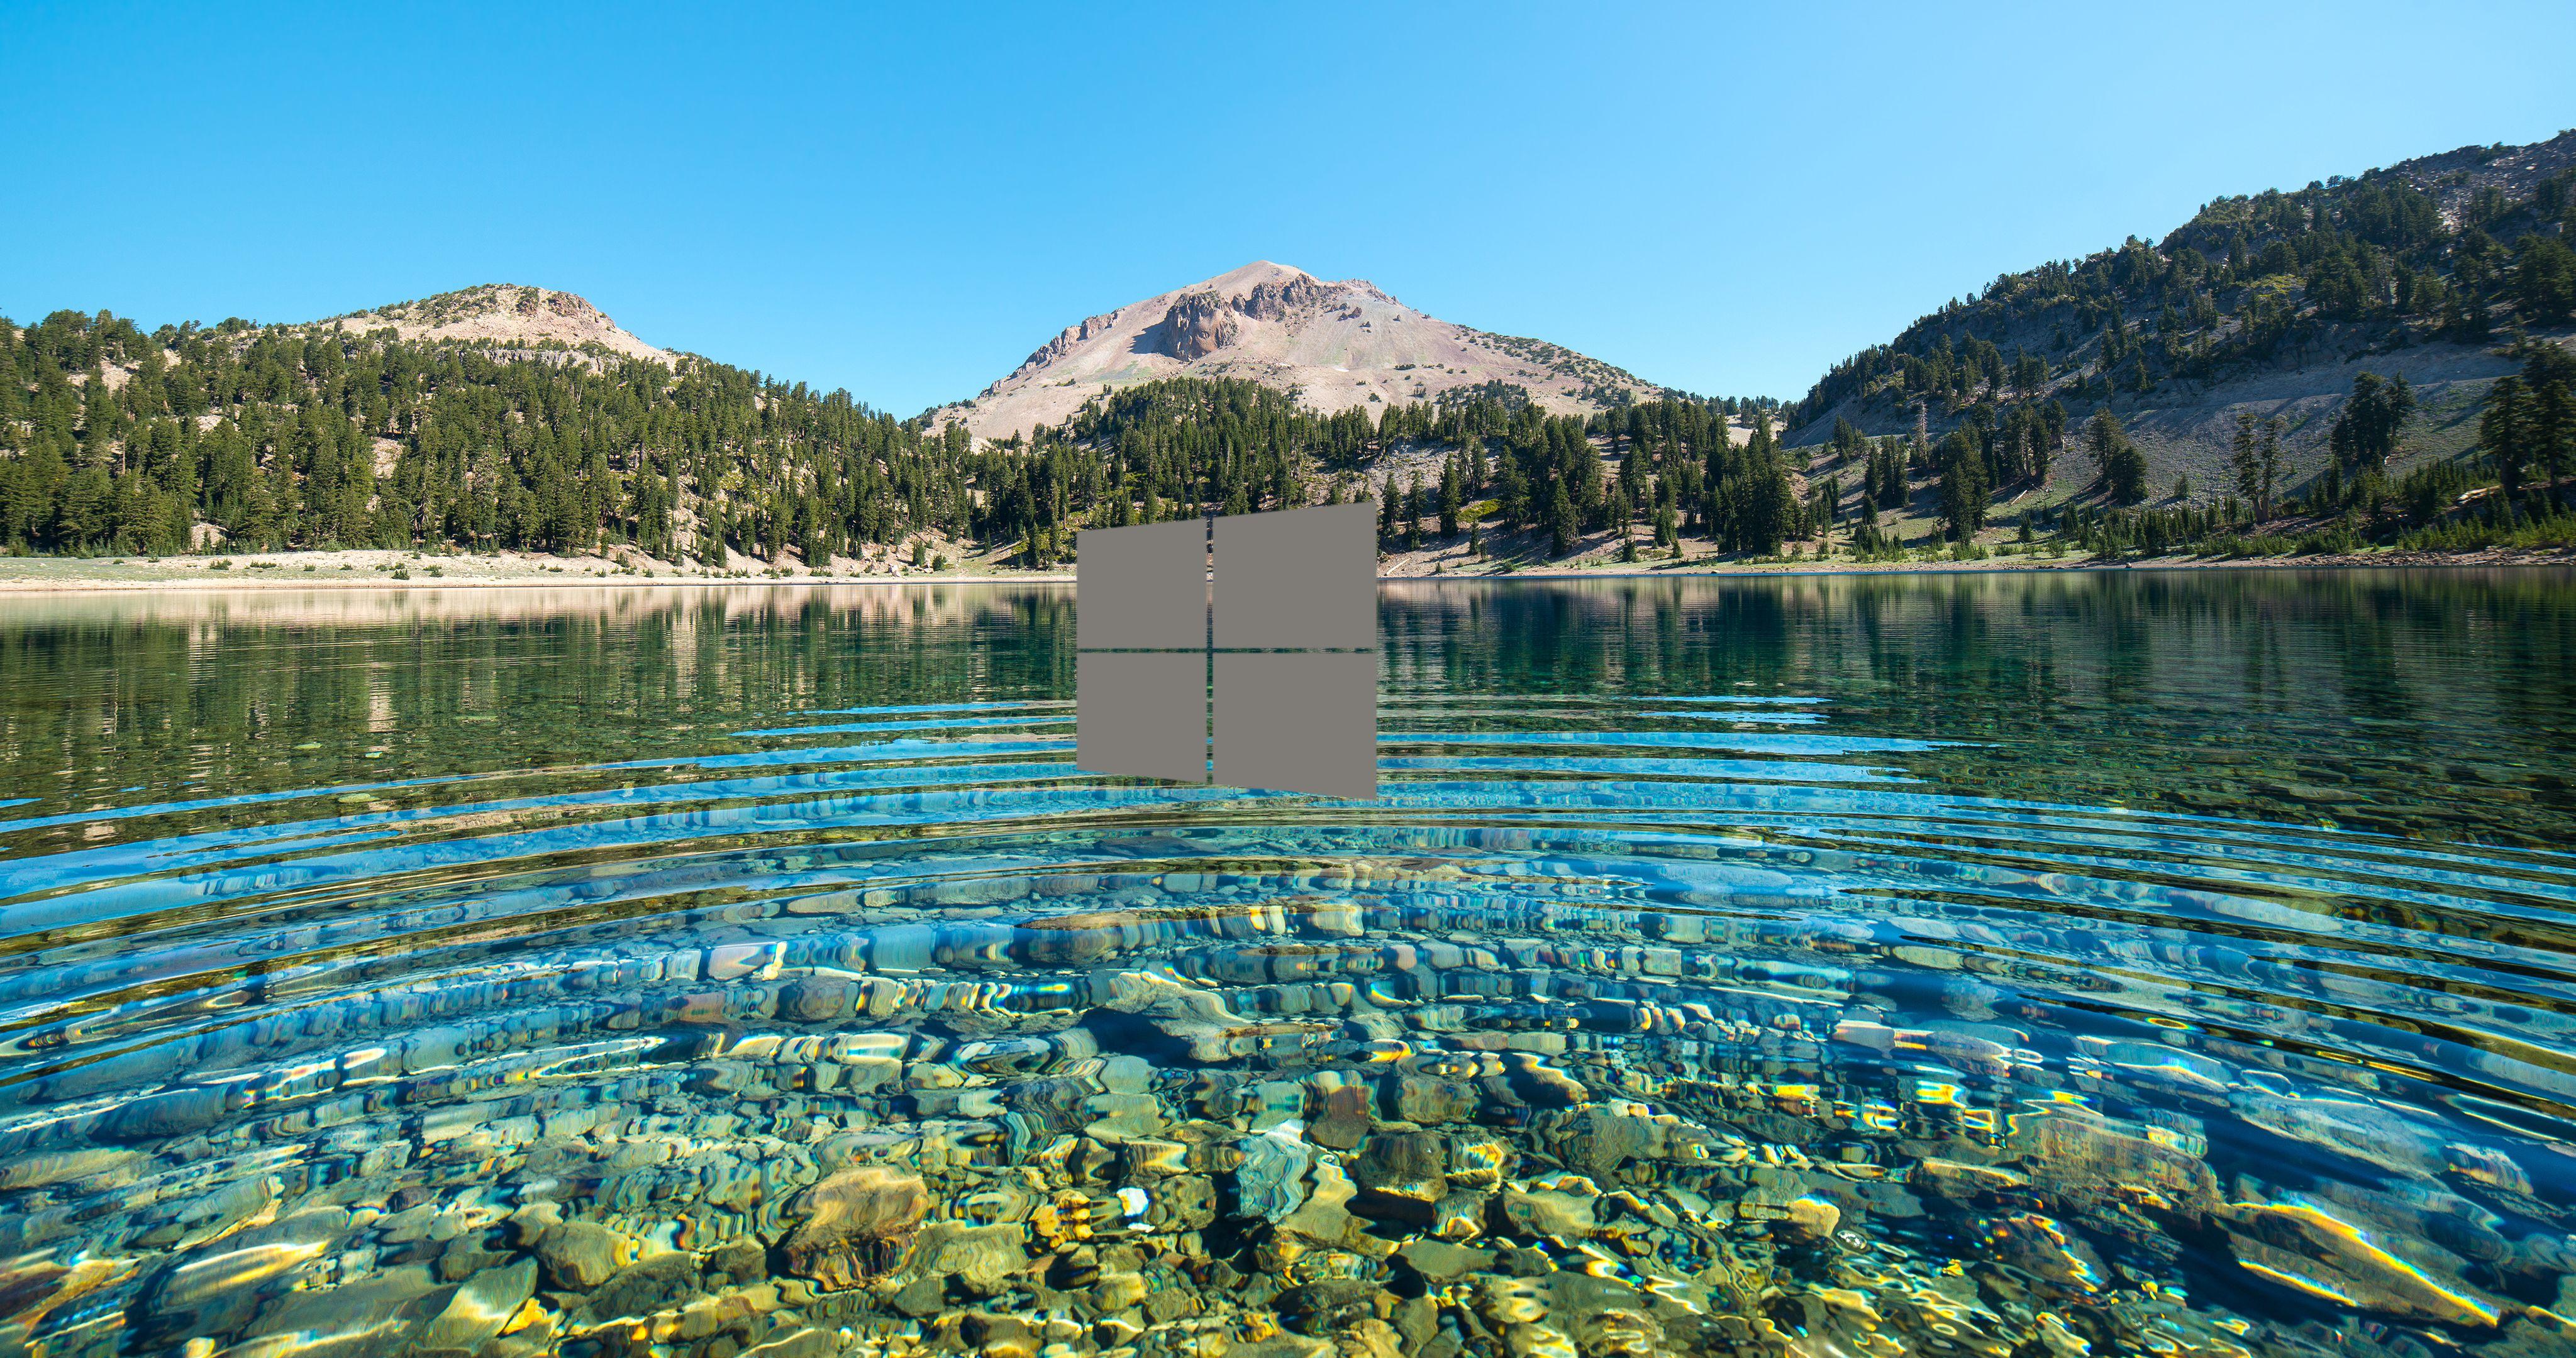 Nature windows wallpaper 4k imagens) Lago, Papel de